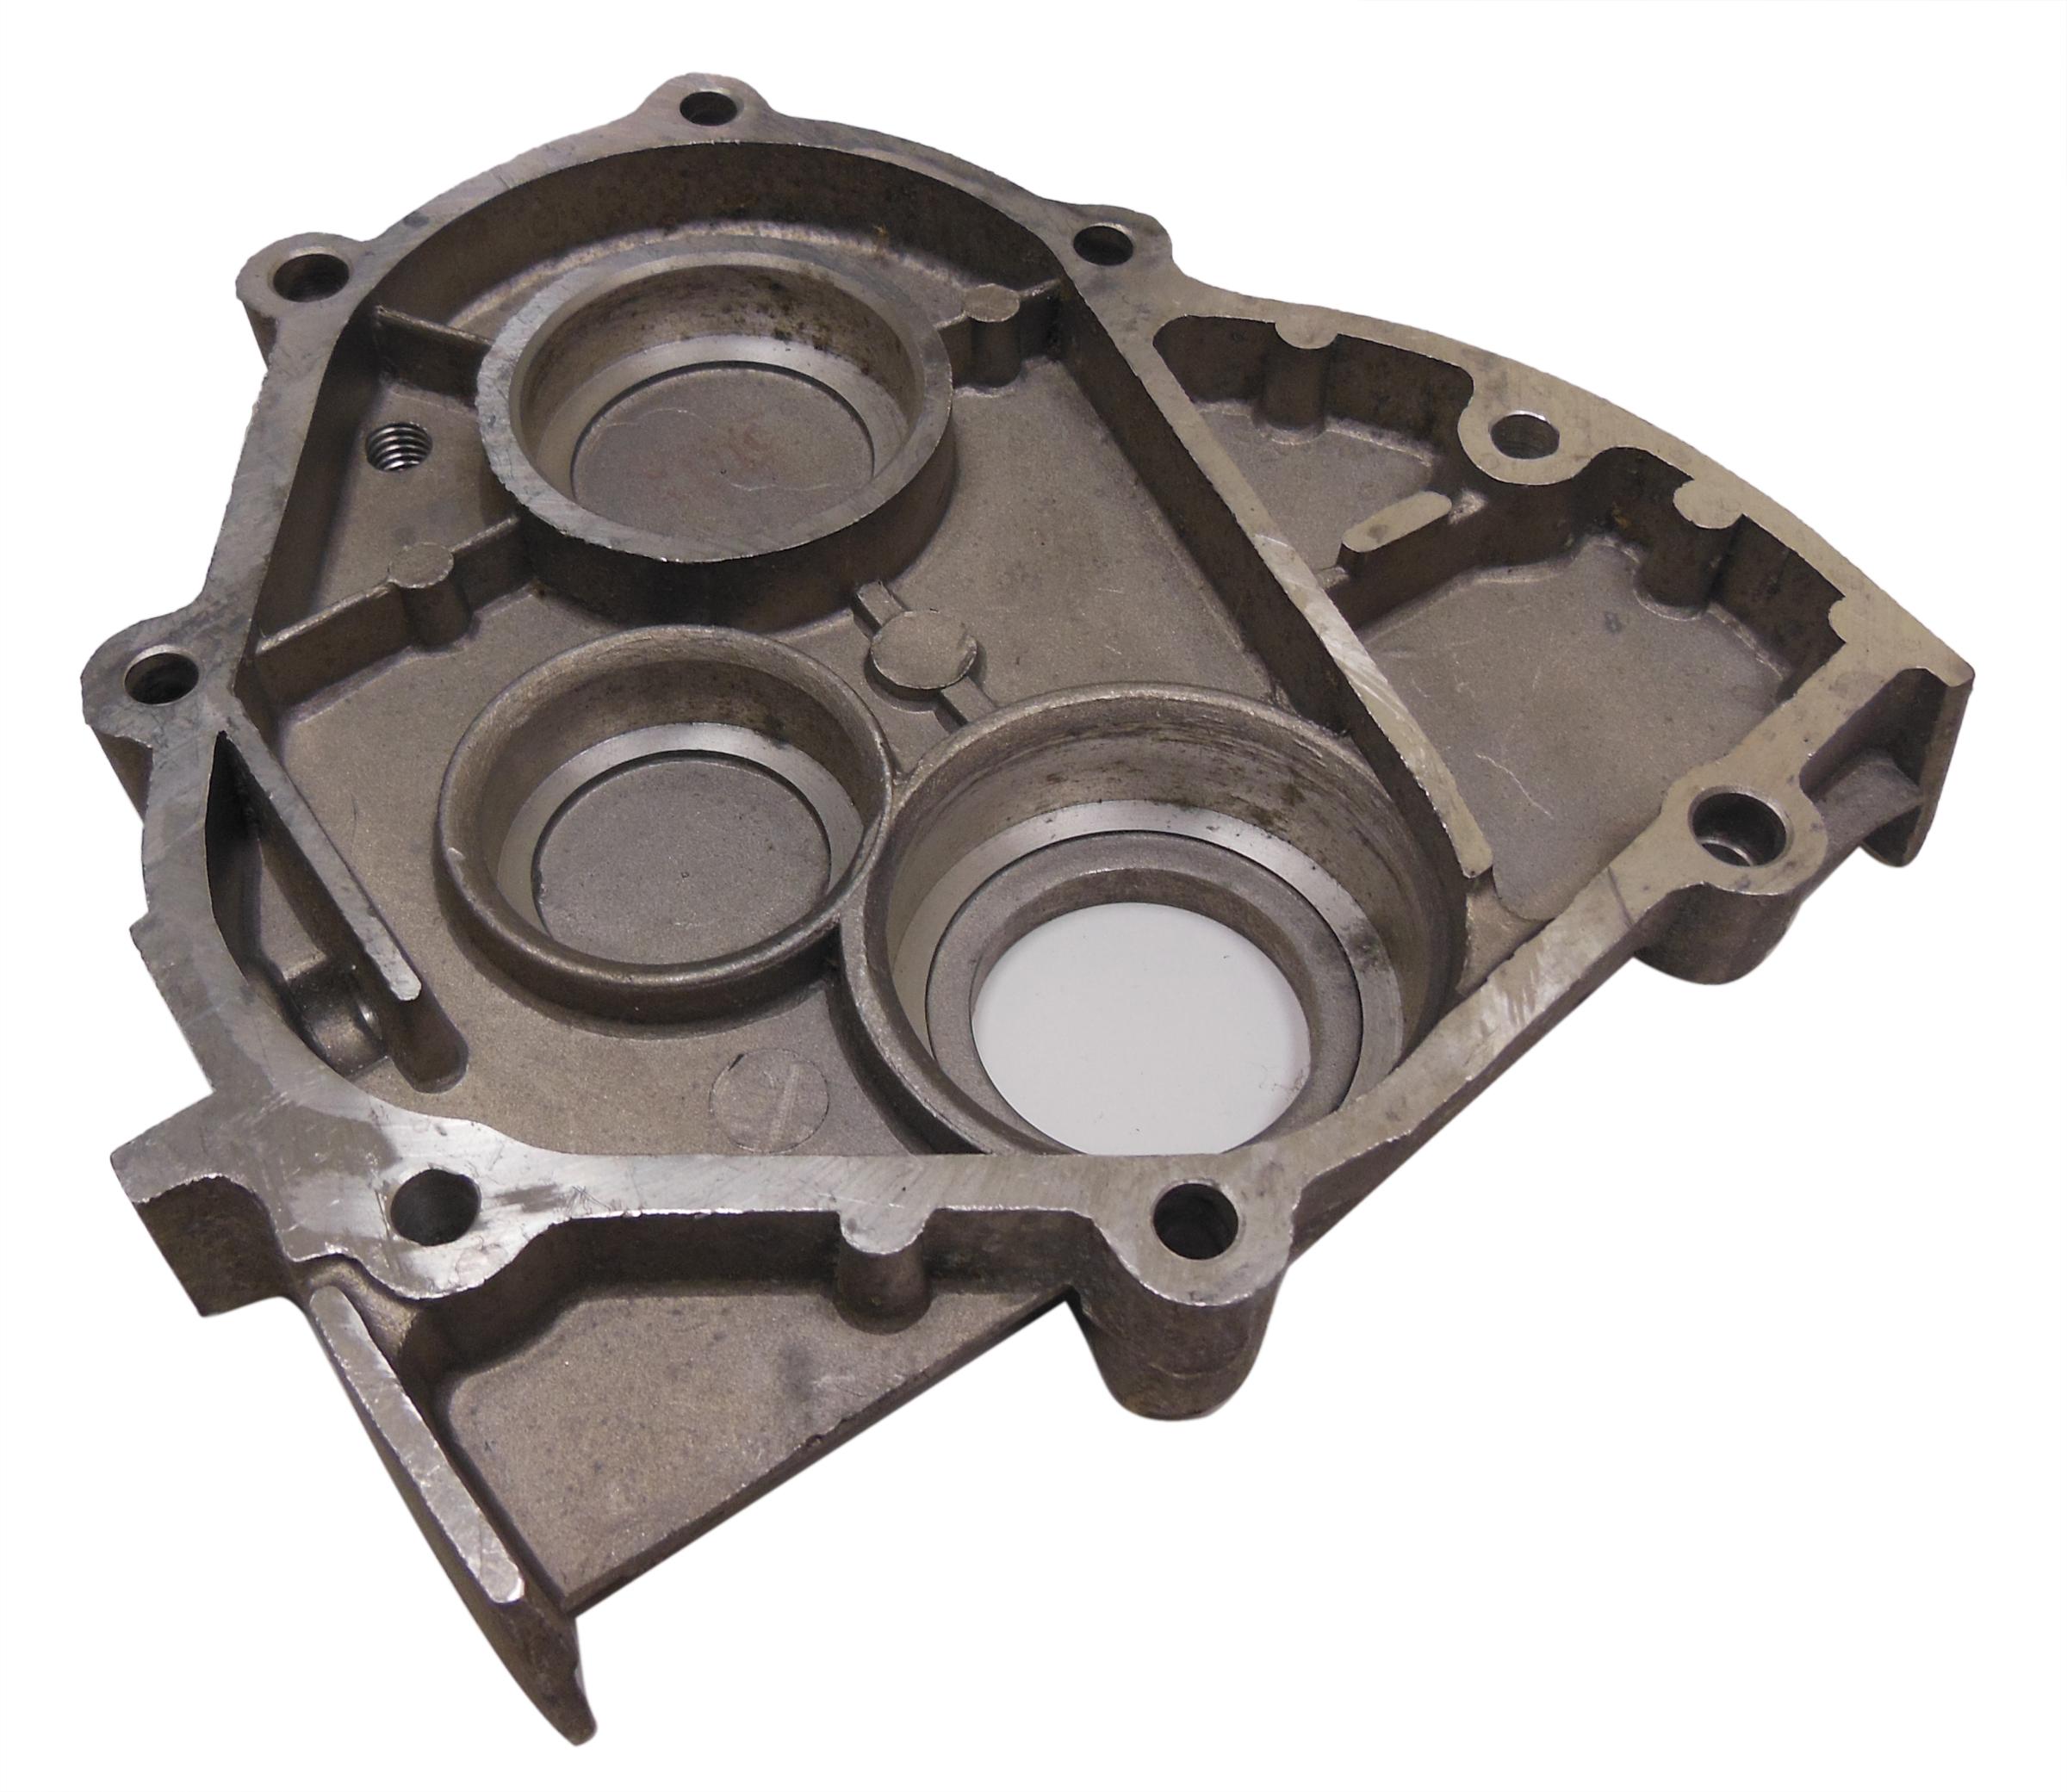 Gy6 150cc Engine Diagram Engine Car Parts And Component Diagram